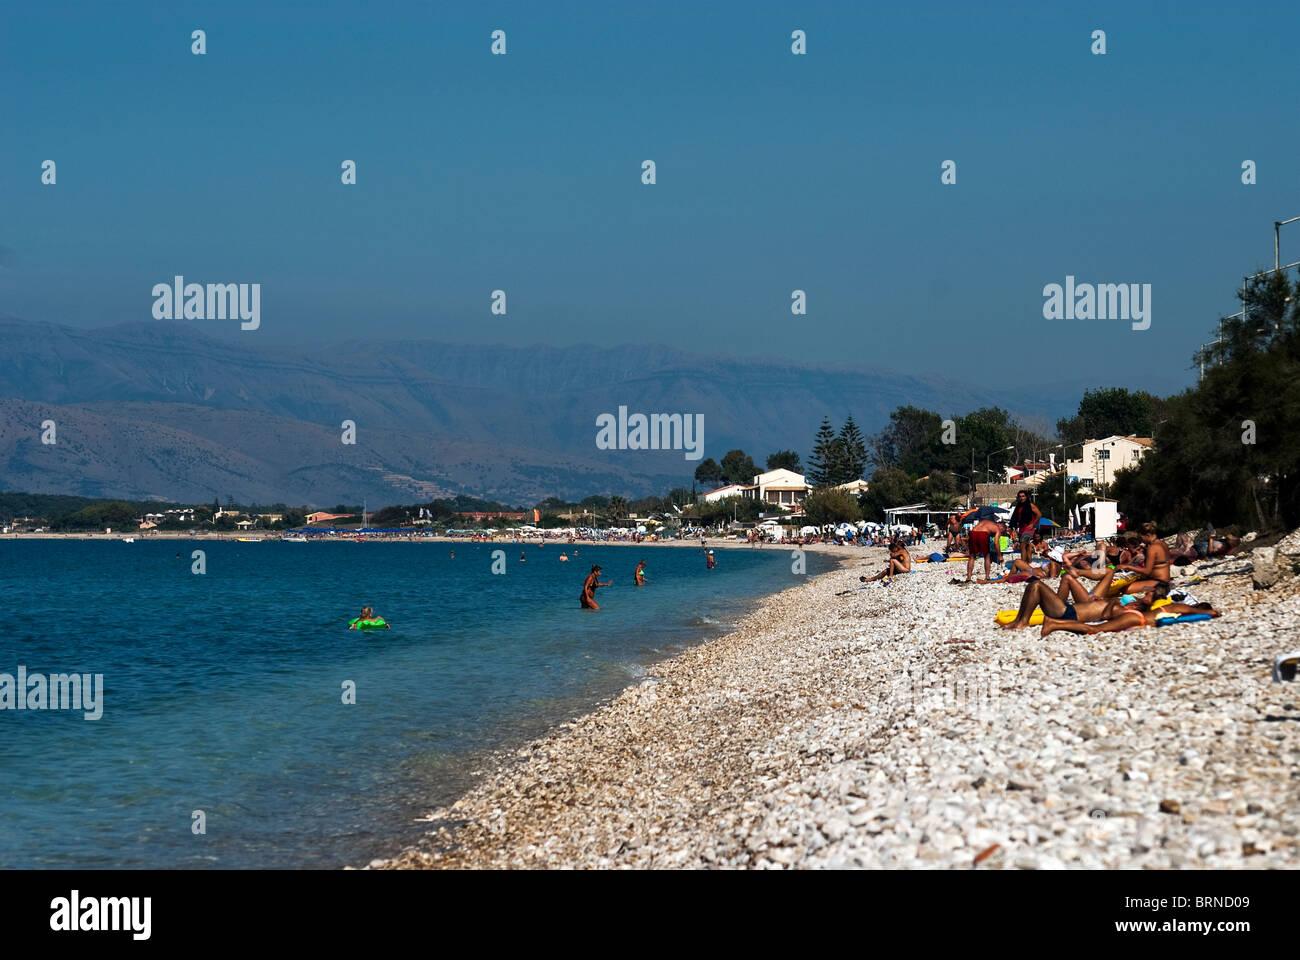 Acharavi Beach, Corfu, Ionian Islands Greece. - Stock Image